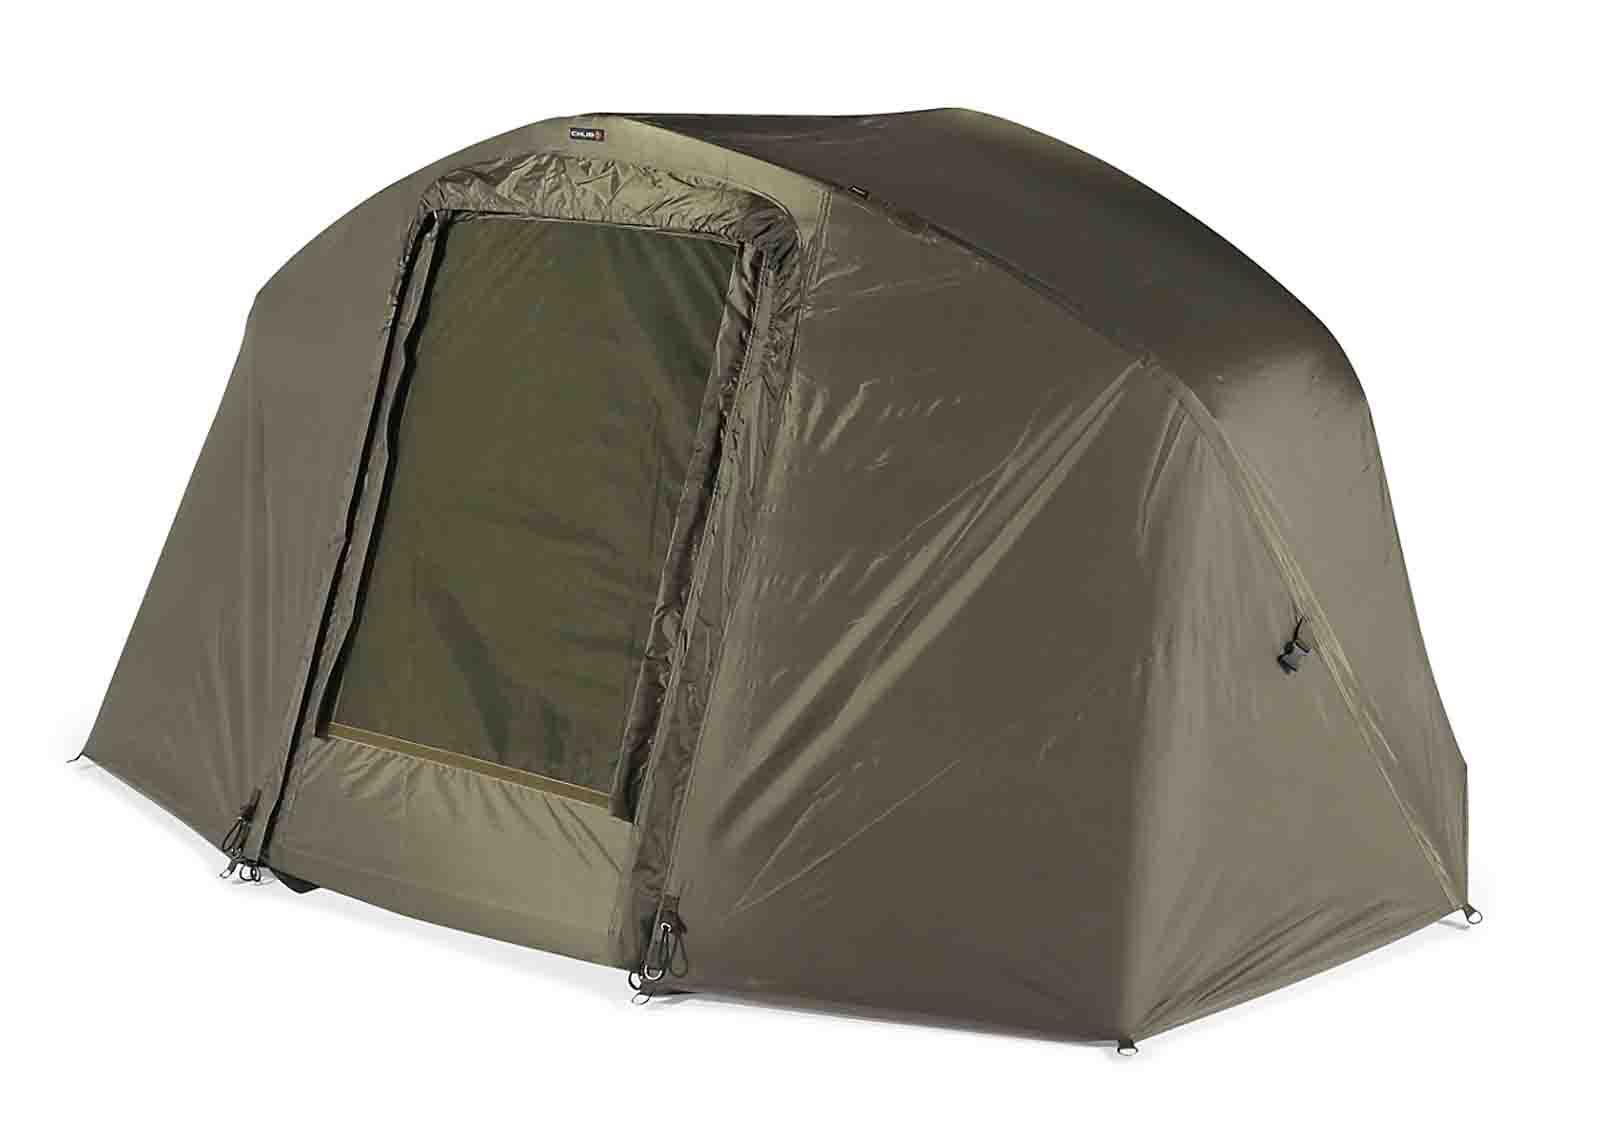 Chub New Outkast Carp Carp Carp Fishing Letterbox Style Door Shelter Overwrap + Carry Bag 9dfde4